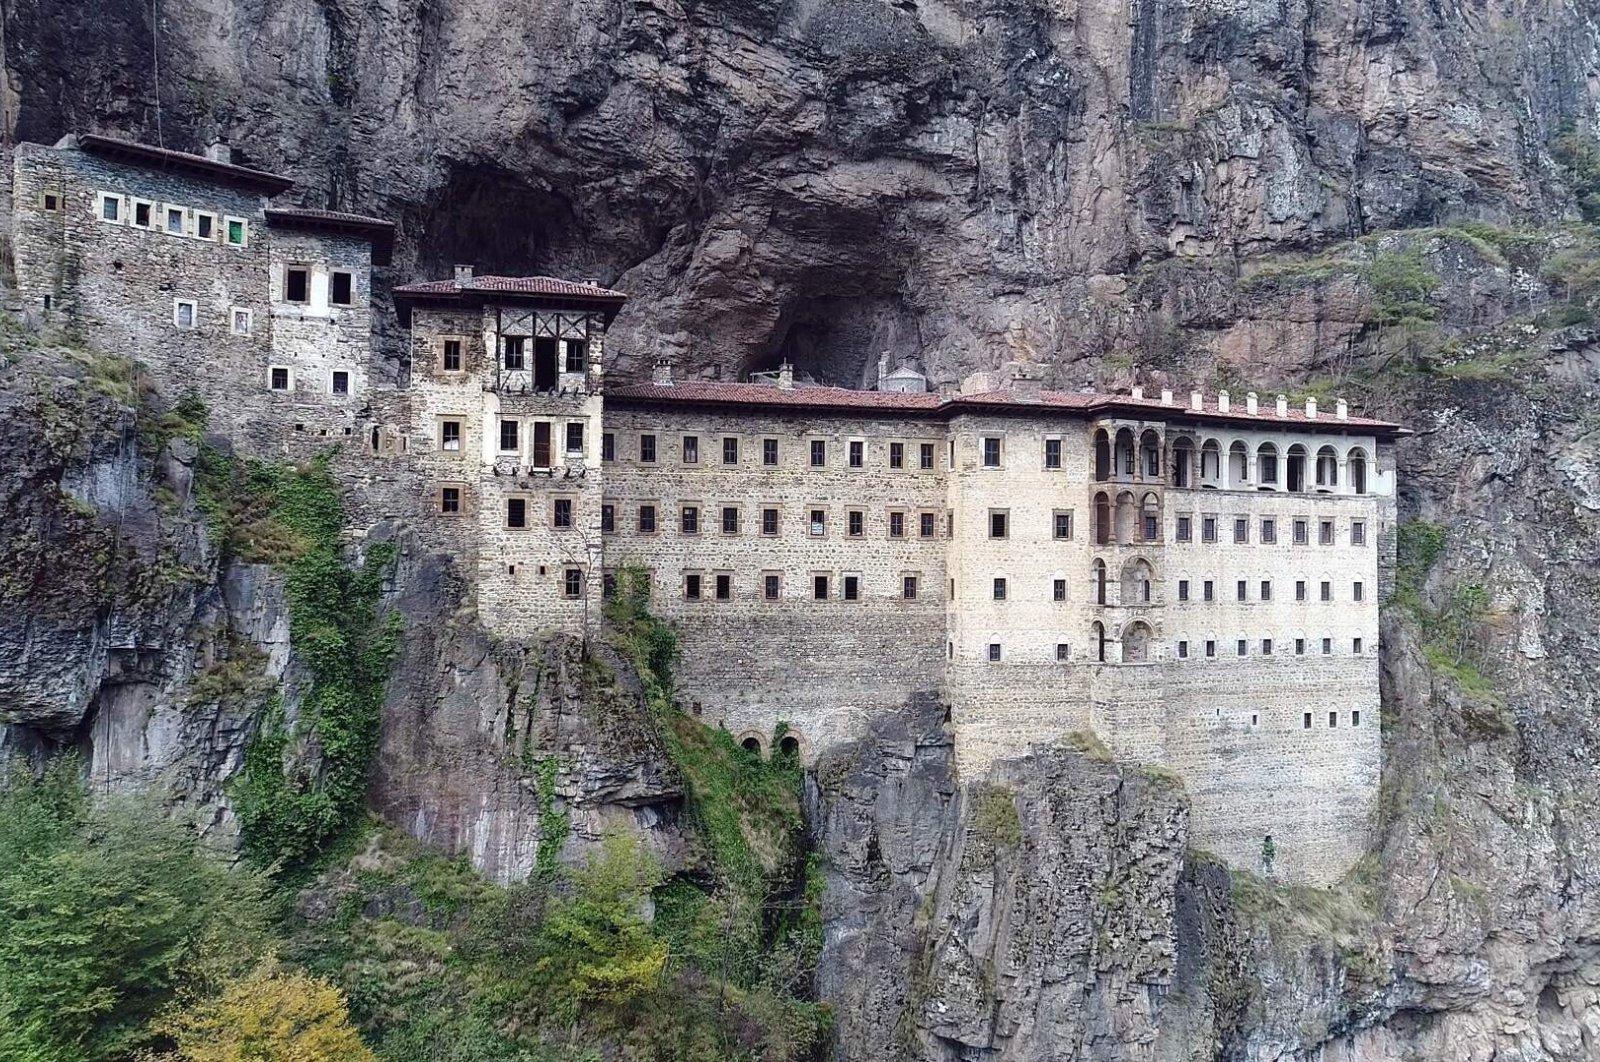 Restoration work at the historical Sümela Monastery restarted nearly 10 days ago. (İHA Photo)